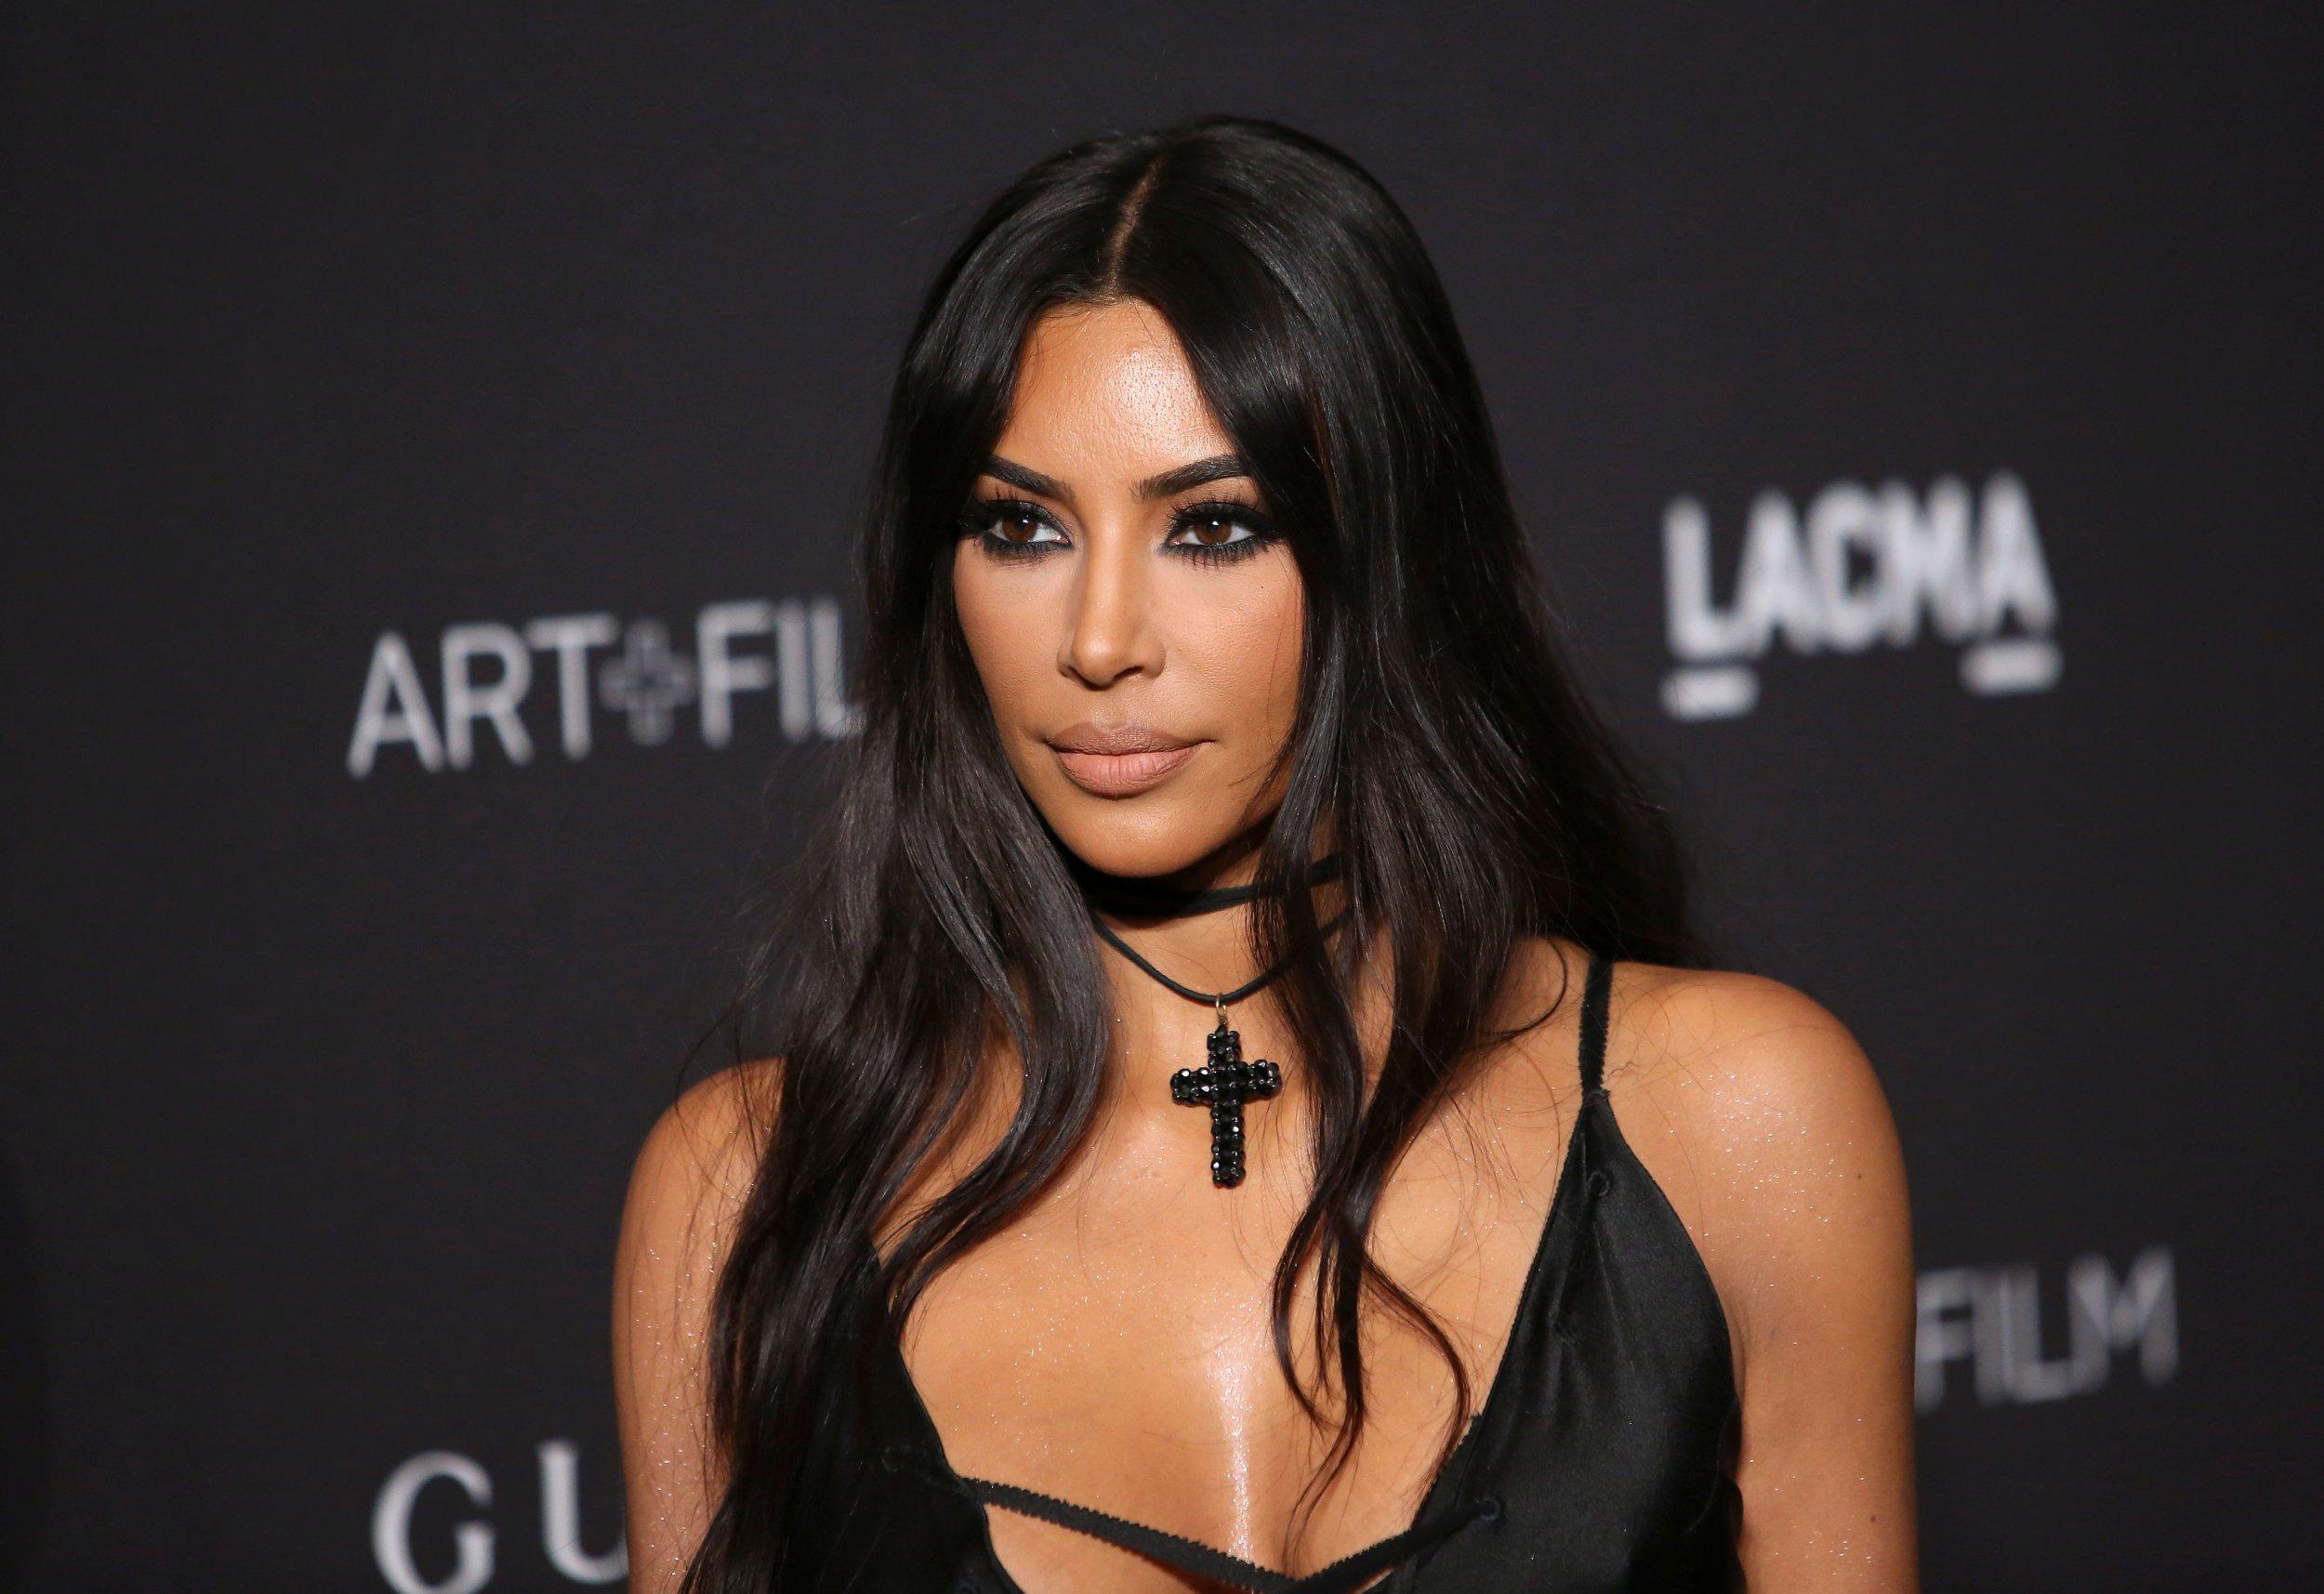 Kim Kardashian Calls Out Tabloid